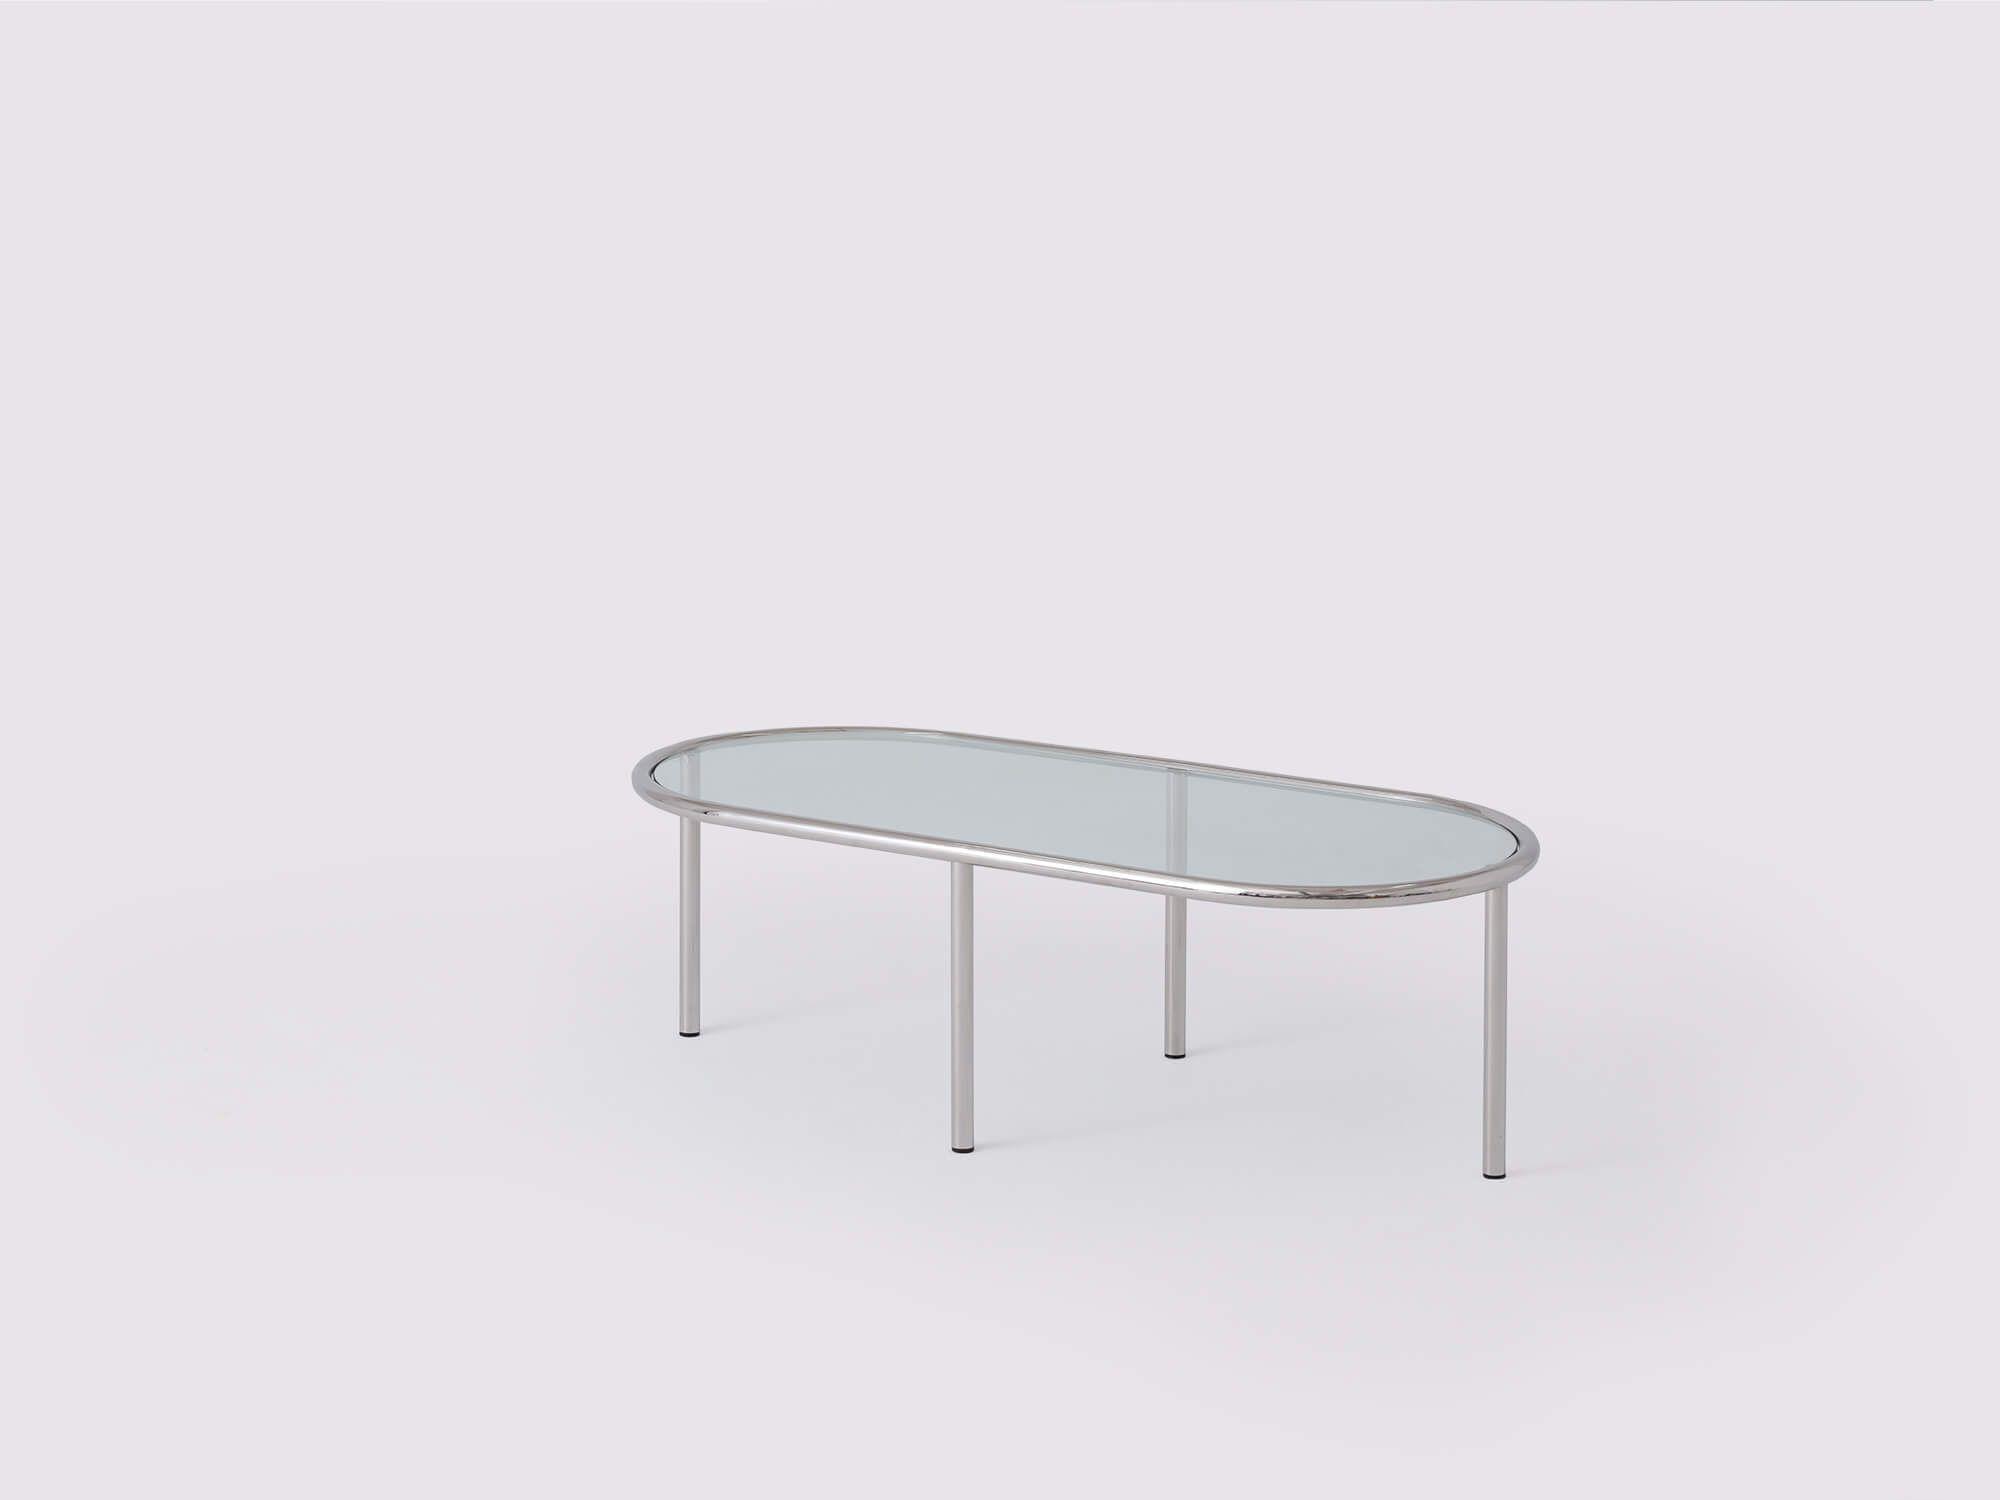 Tubular Coffee Table Eq3 Coffee Table Table Round Coffee Table [ 1500 x 2000 Pixel ]